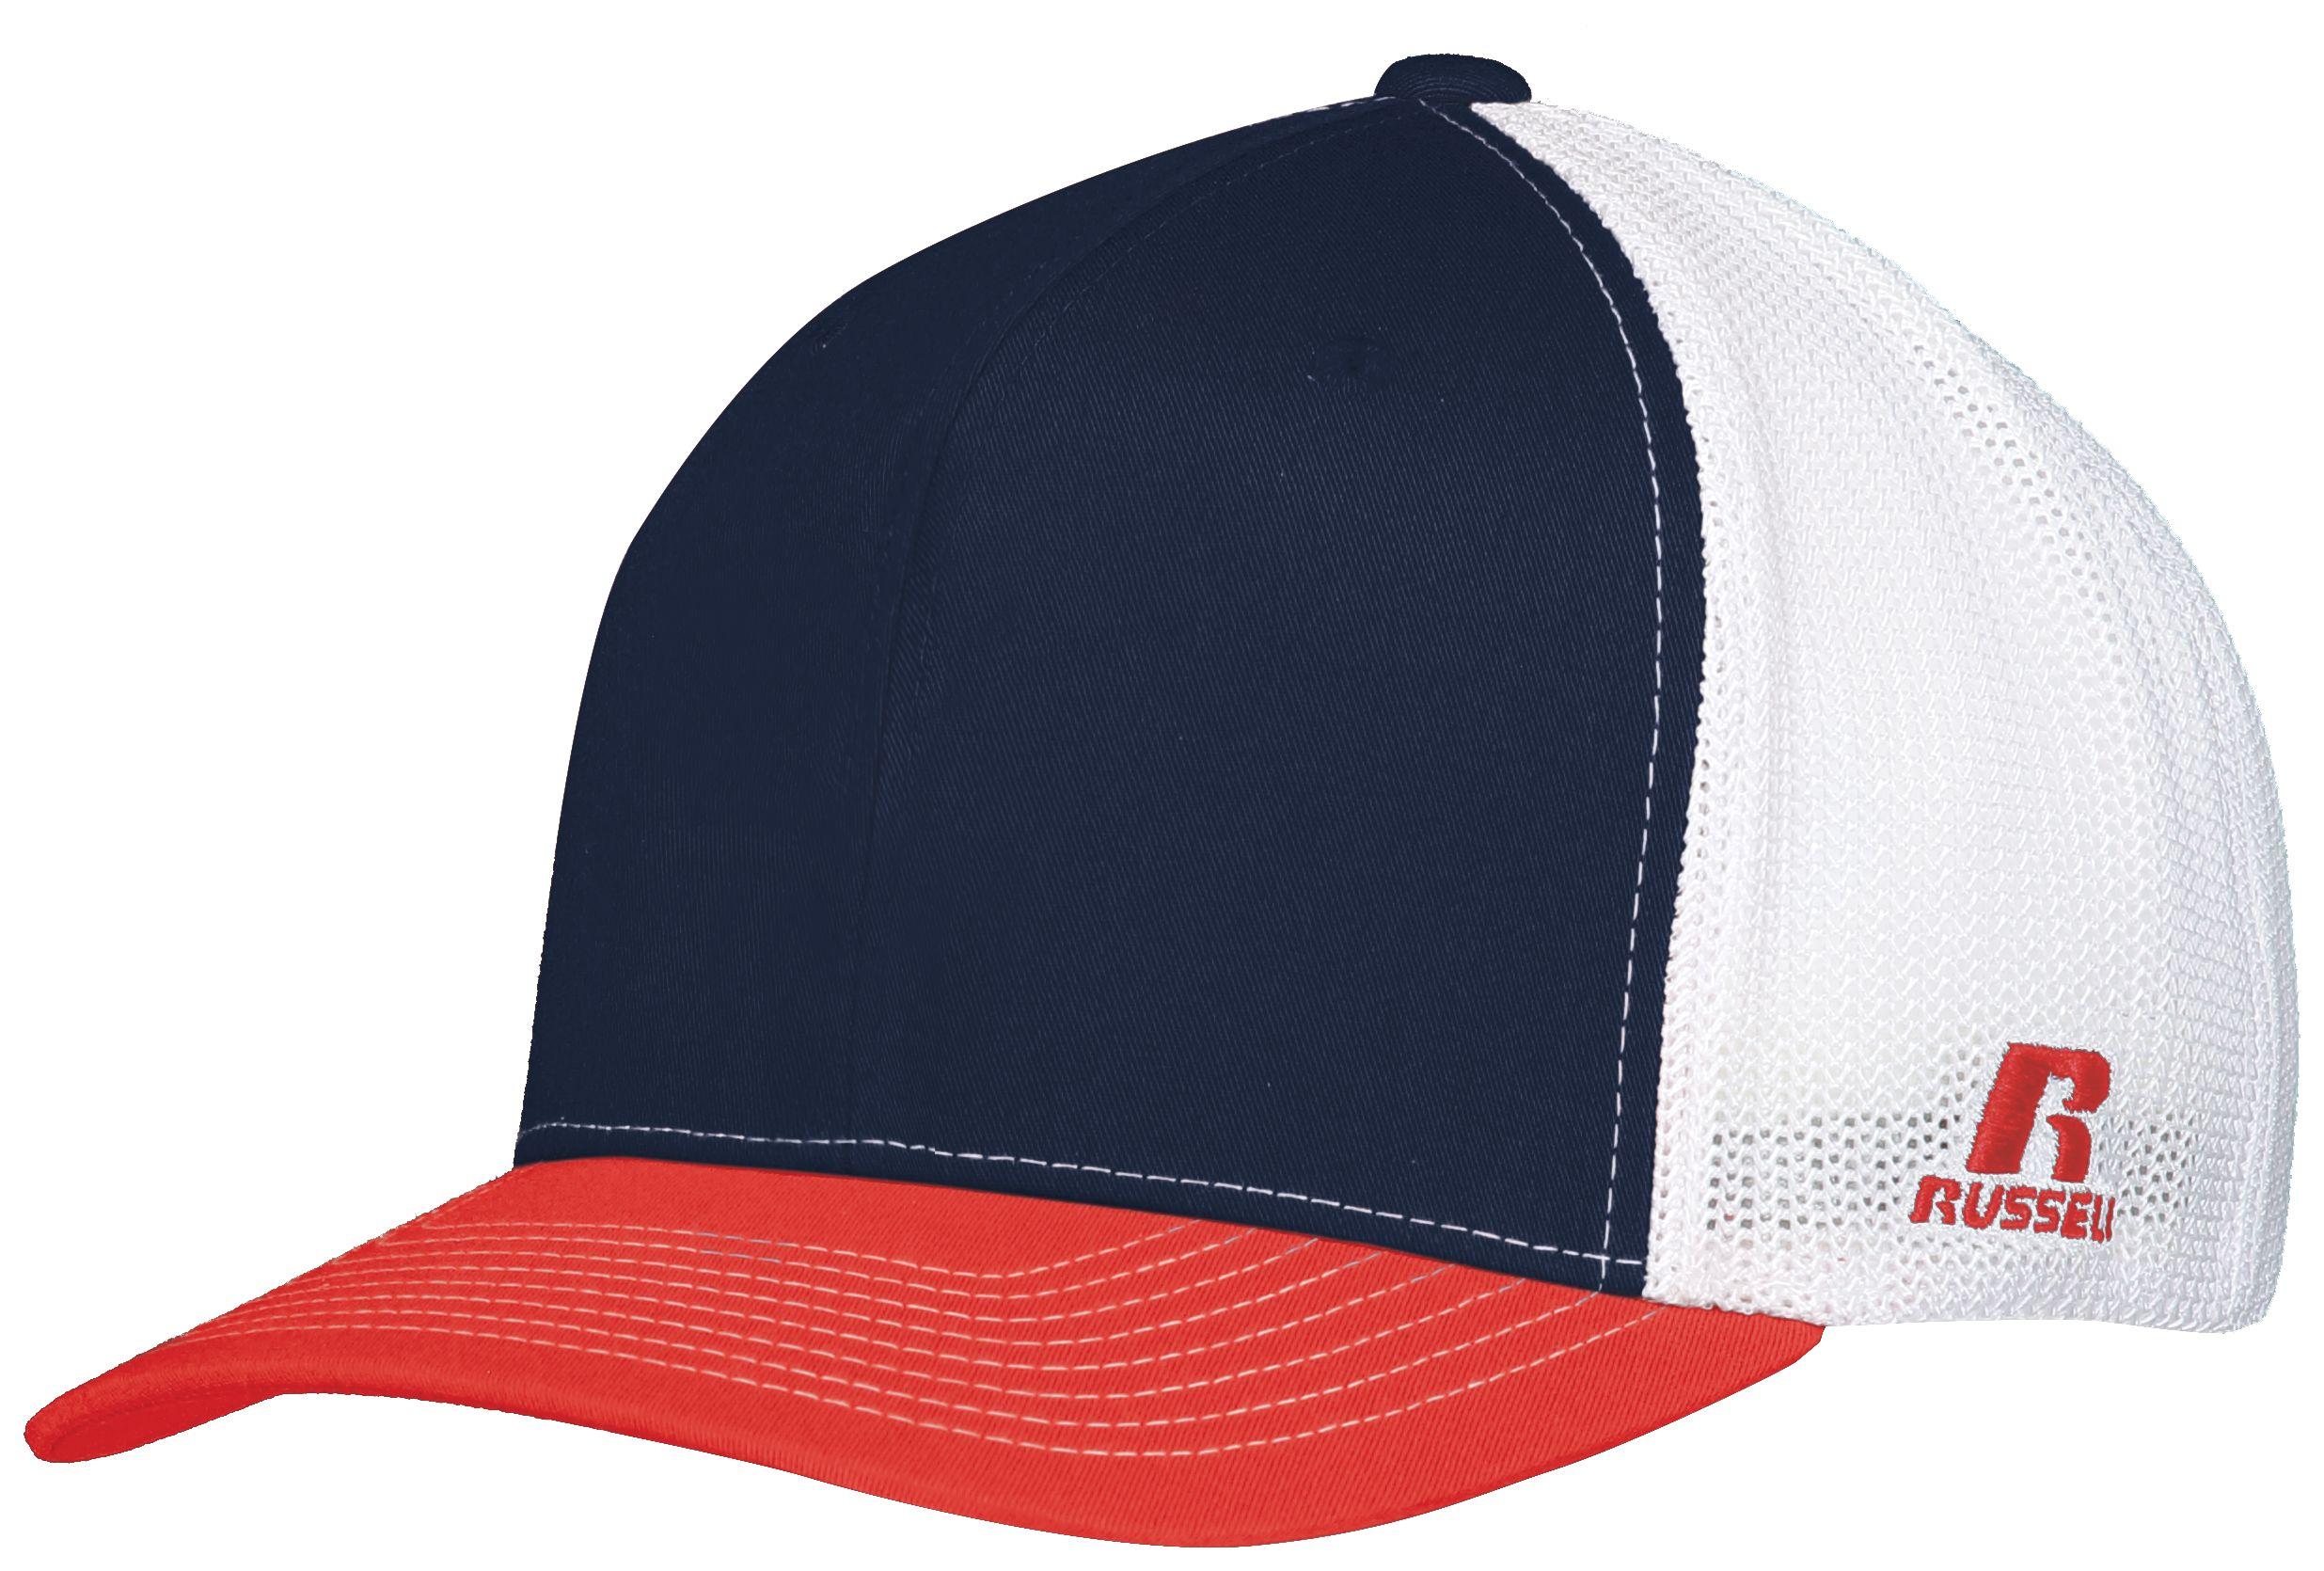 Youth Flexfit Twill Mesh Cap - NAVY/TRUE RED/WHITE